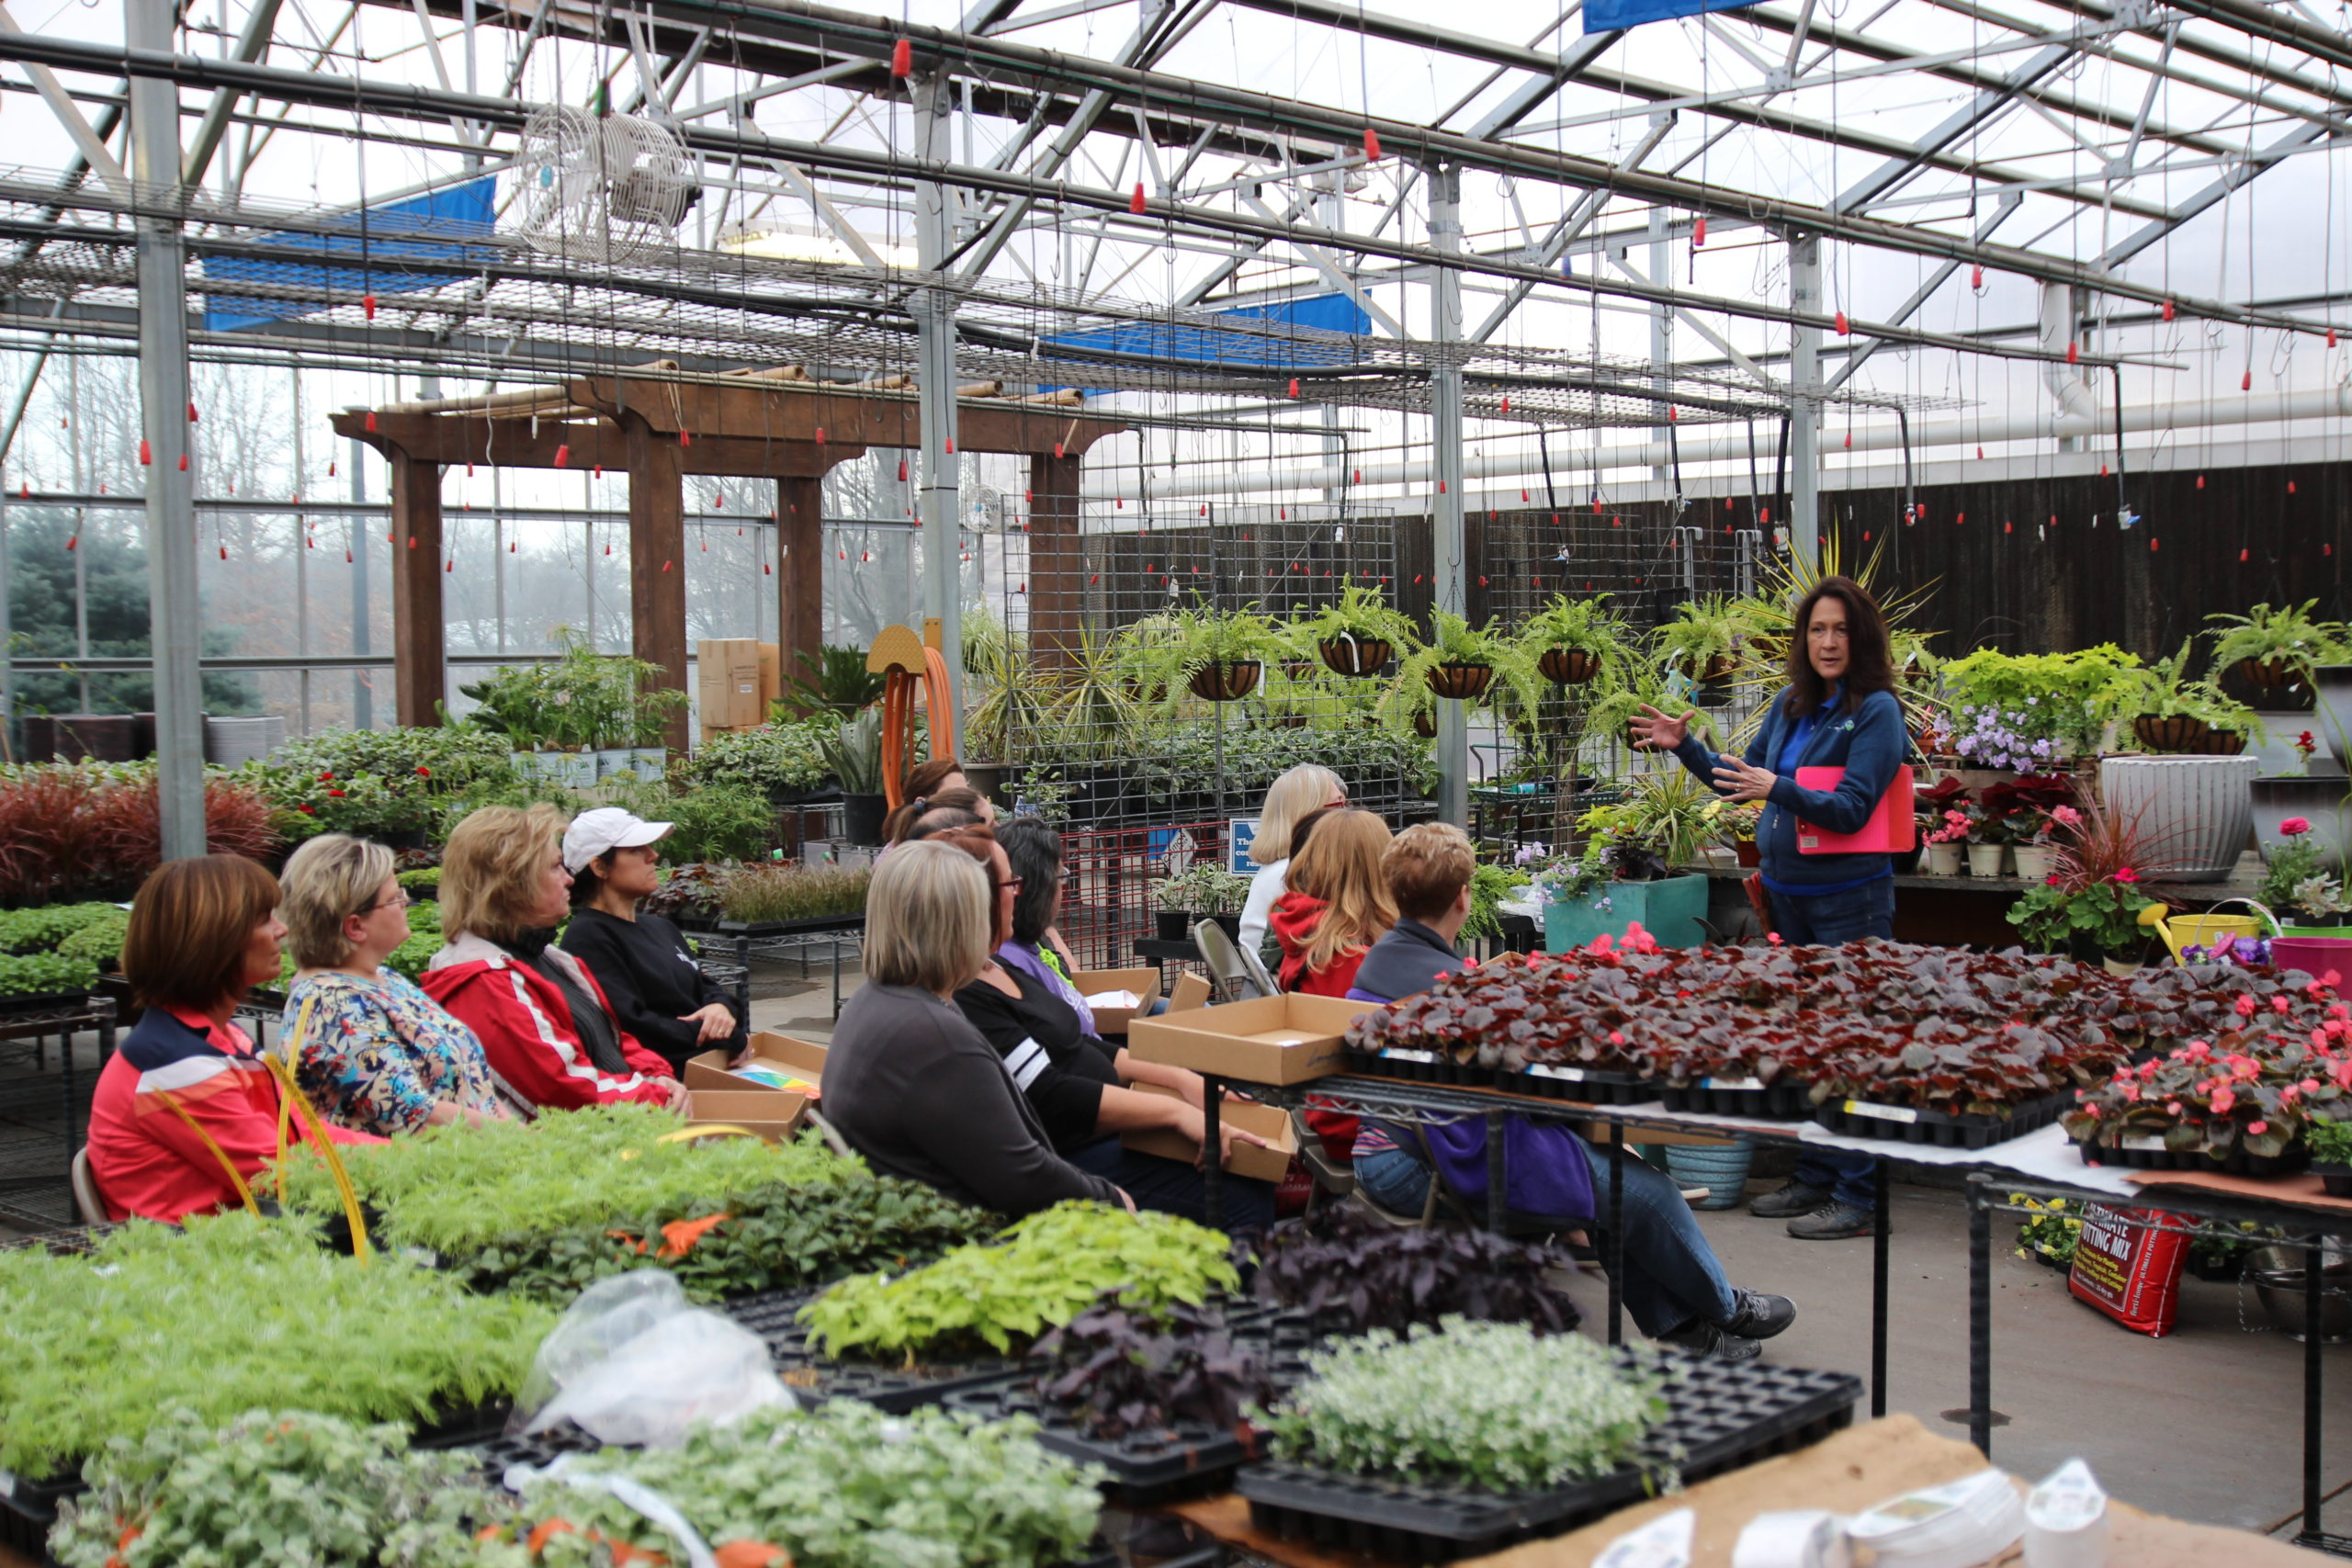 DIY Container Garden: A Hands-on Workshop